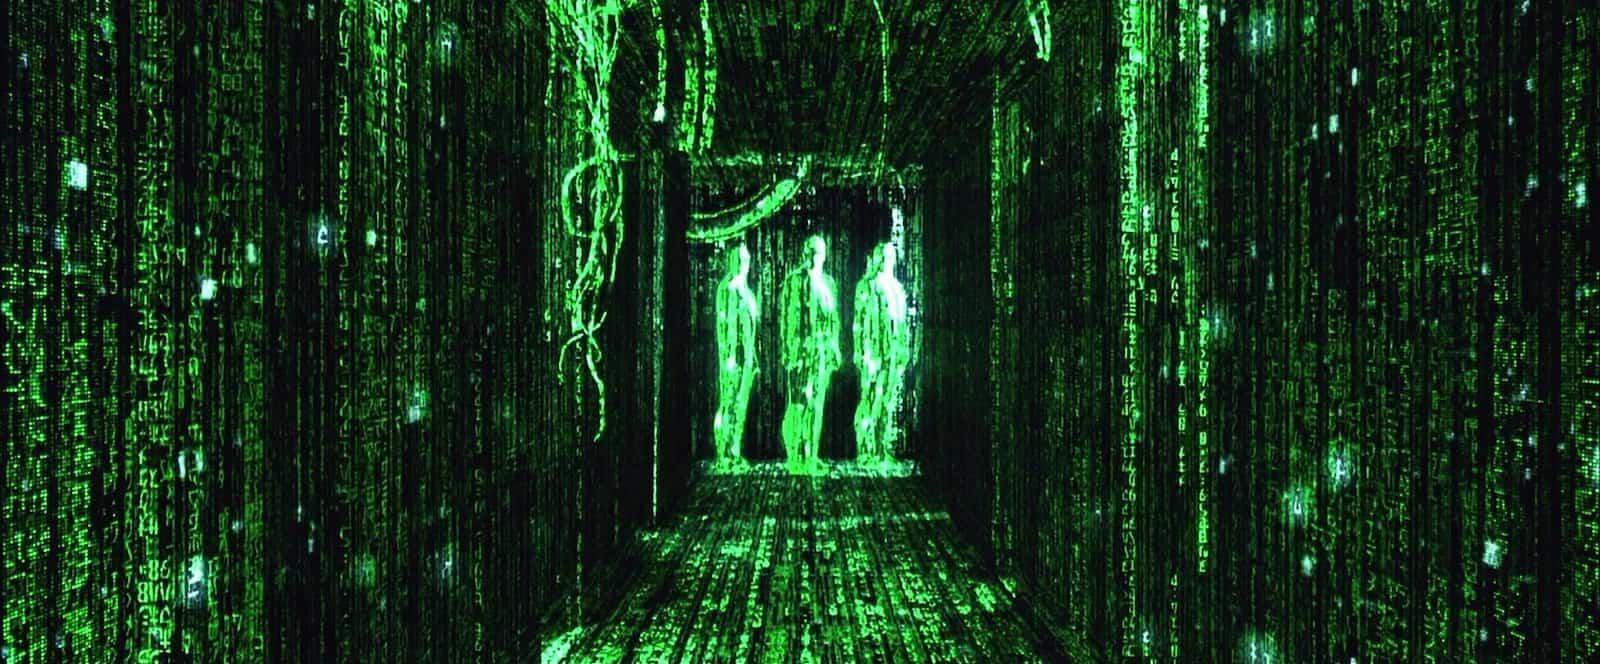 What is VFX - The Matrix - Code